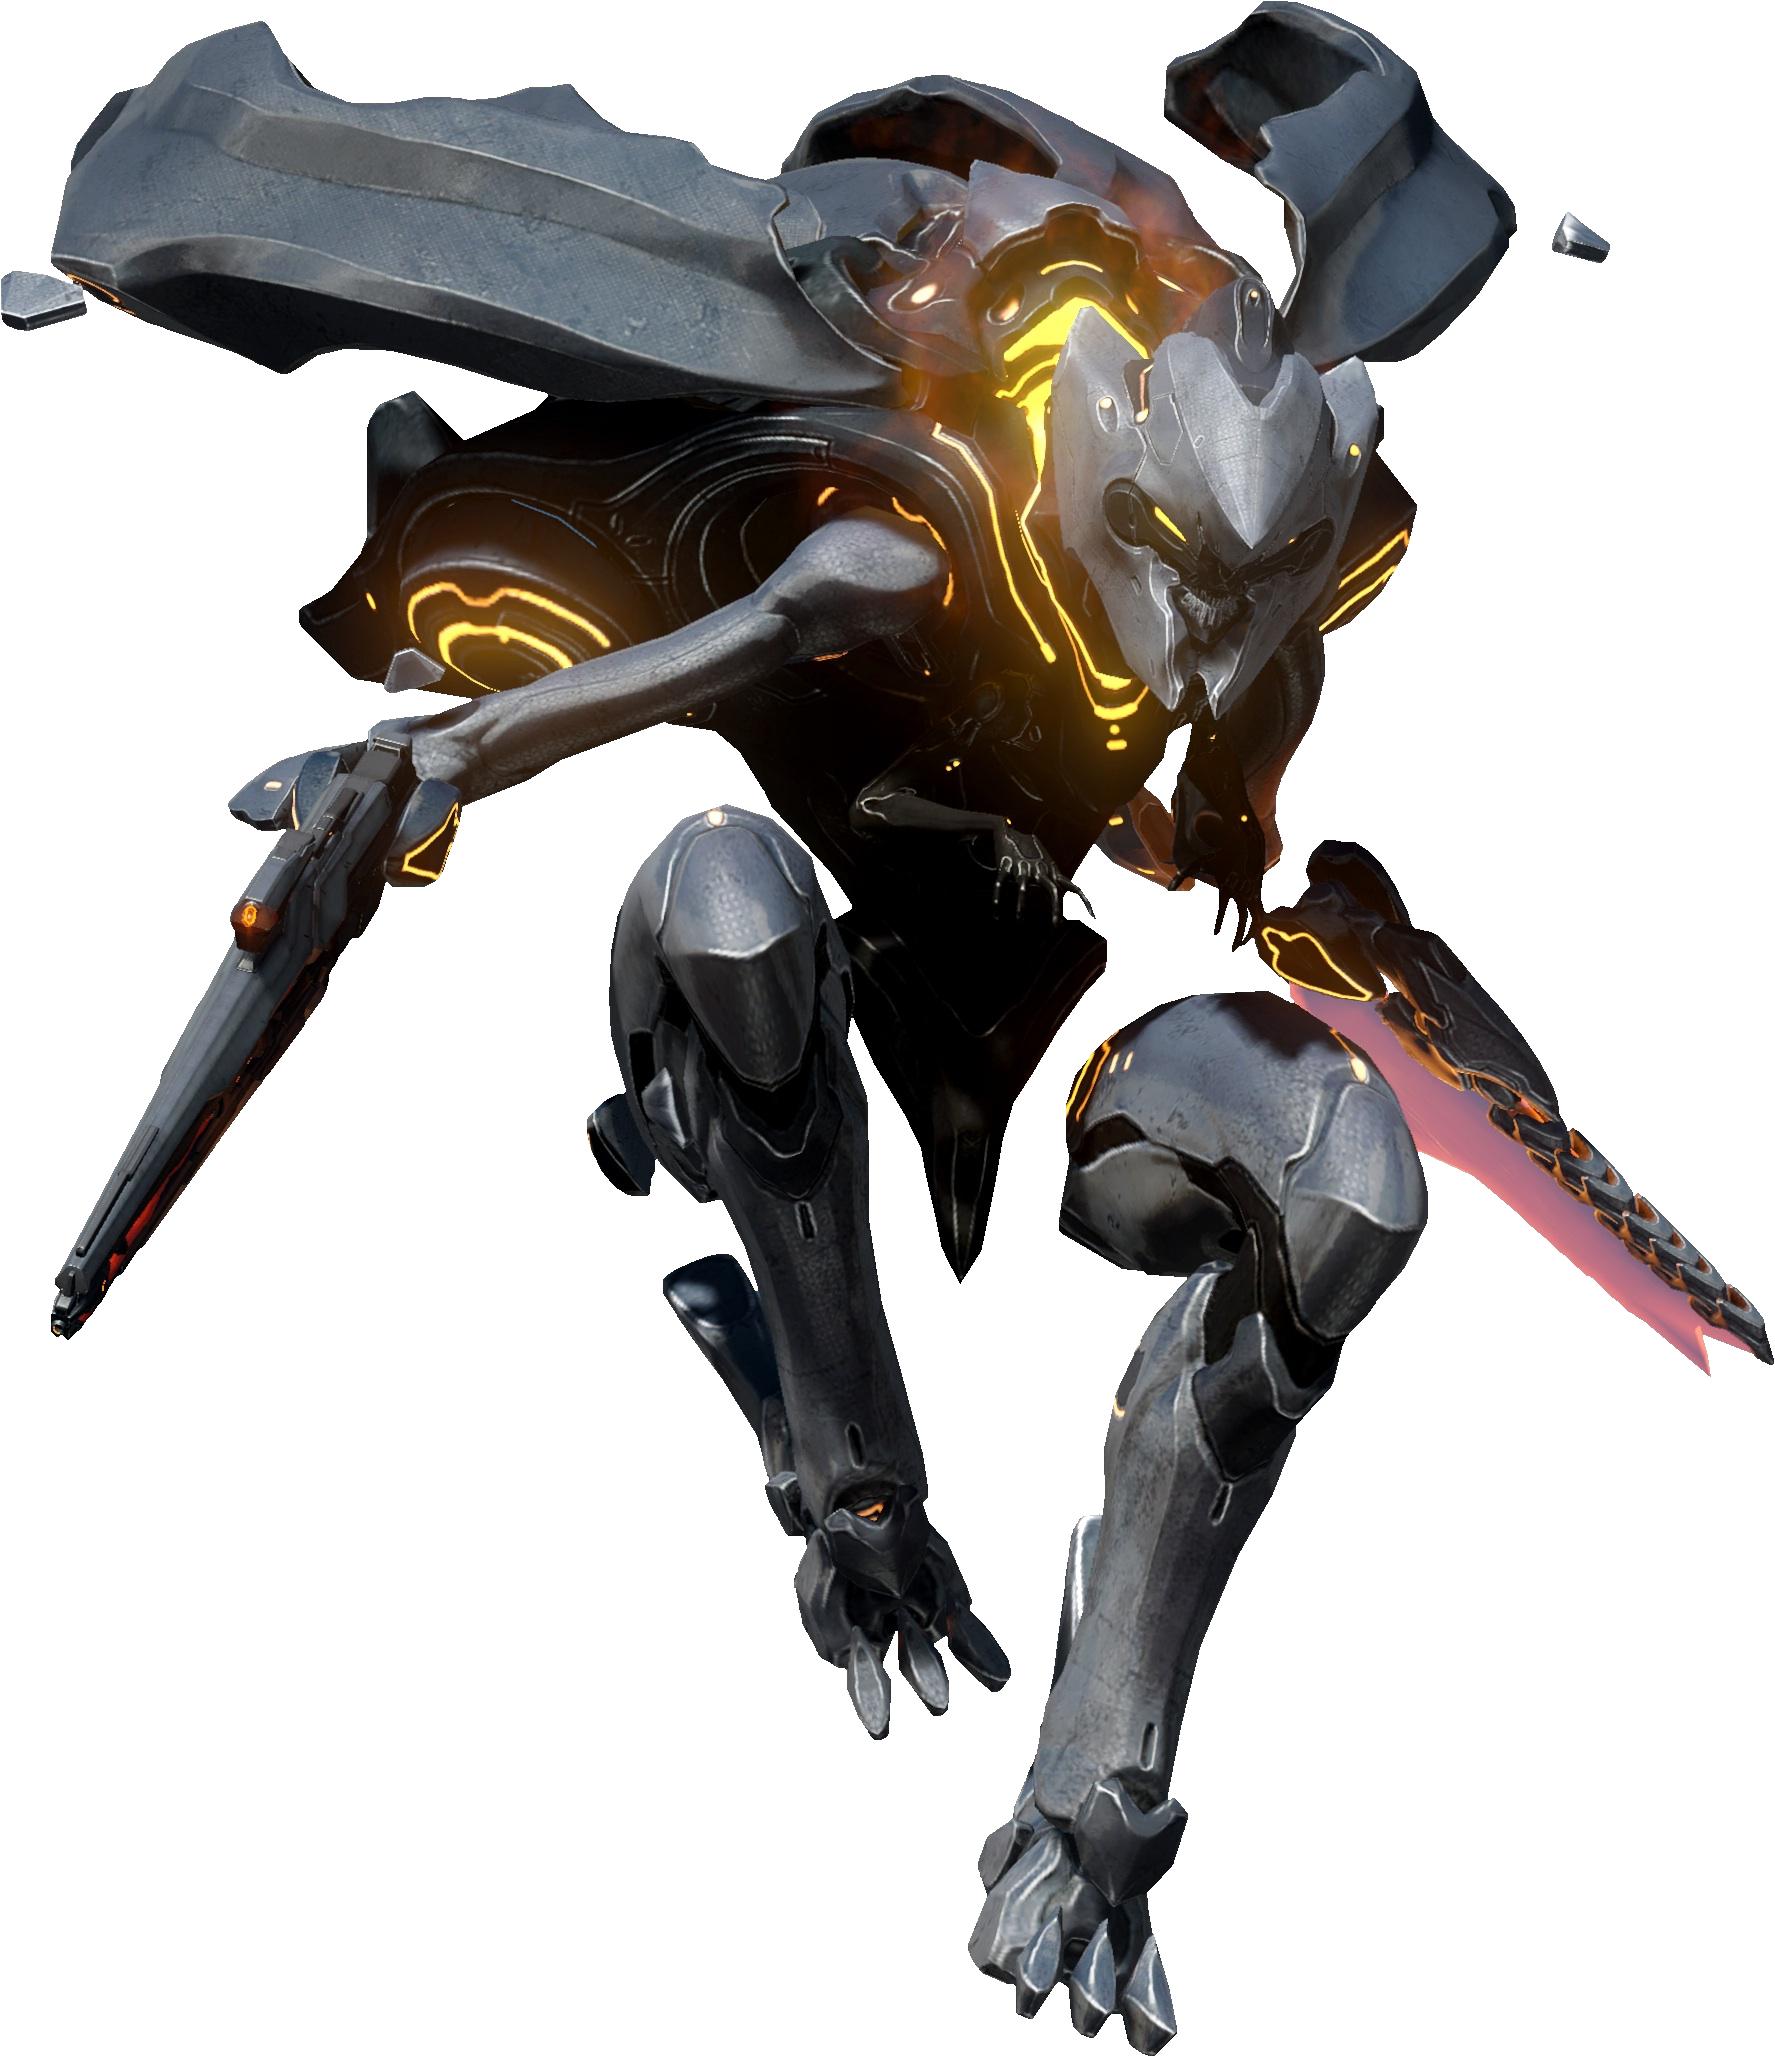 Chitauri vs promethean knights spacebattles forums - Spacebattles com ...